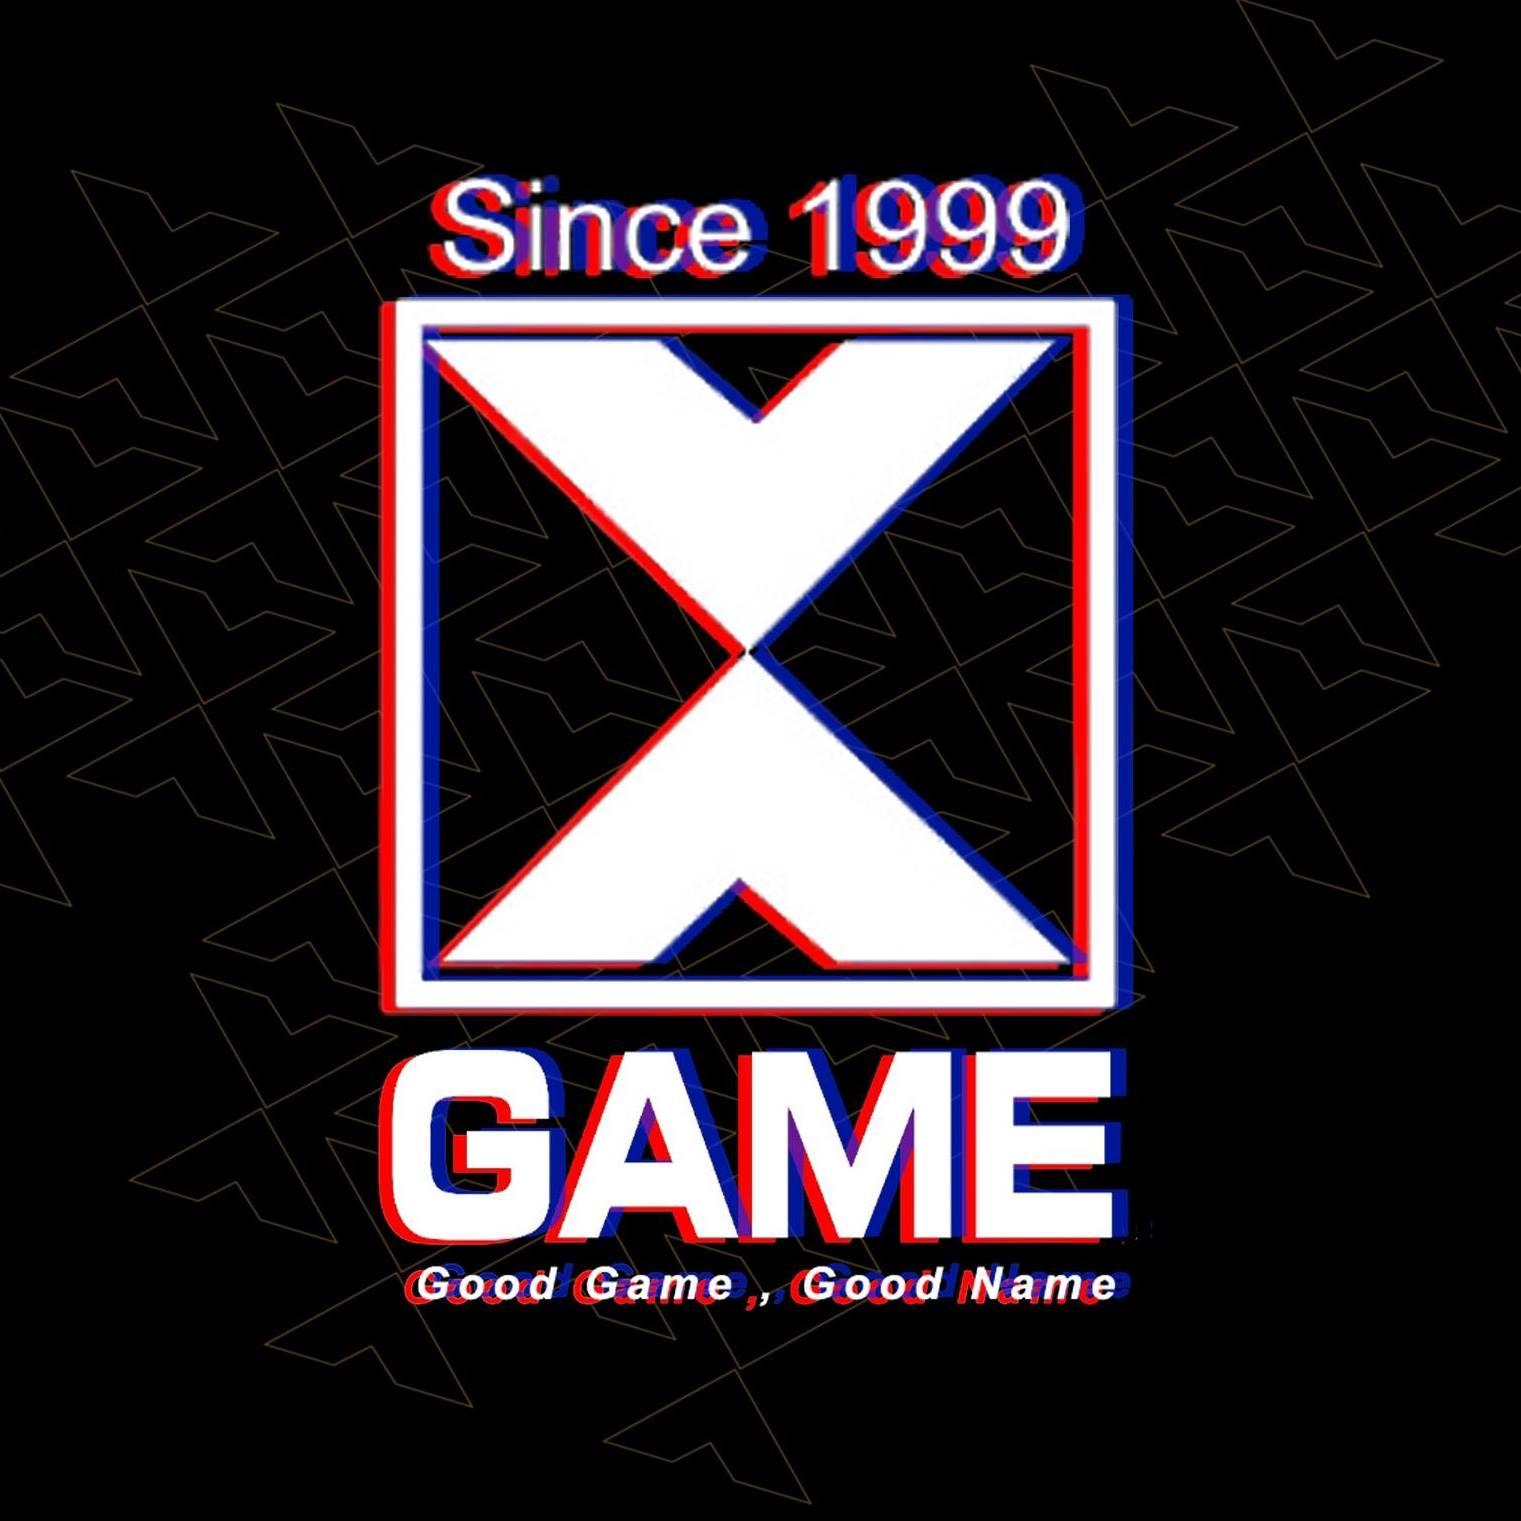 إكس جيم ستورز XGame Stores